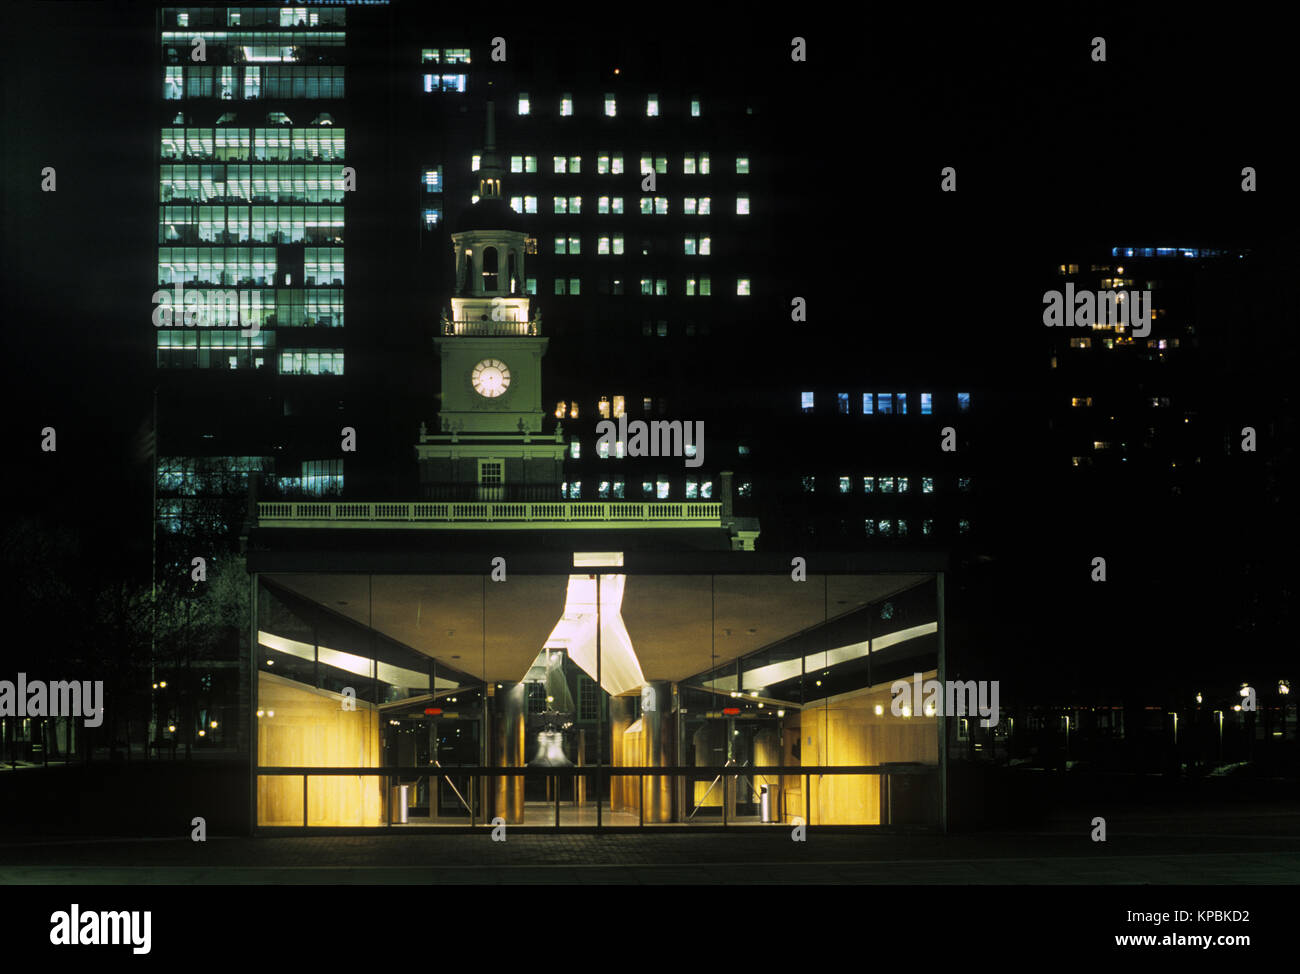 1988 HISTORICAL CLOCK TOWER INDEPENDENCE HALL INDEPENDENCE MALL PHILADELPHIA PENNSYLVANIA USA - Stock Image